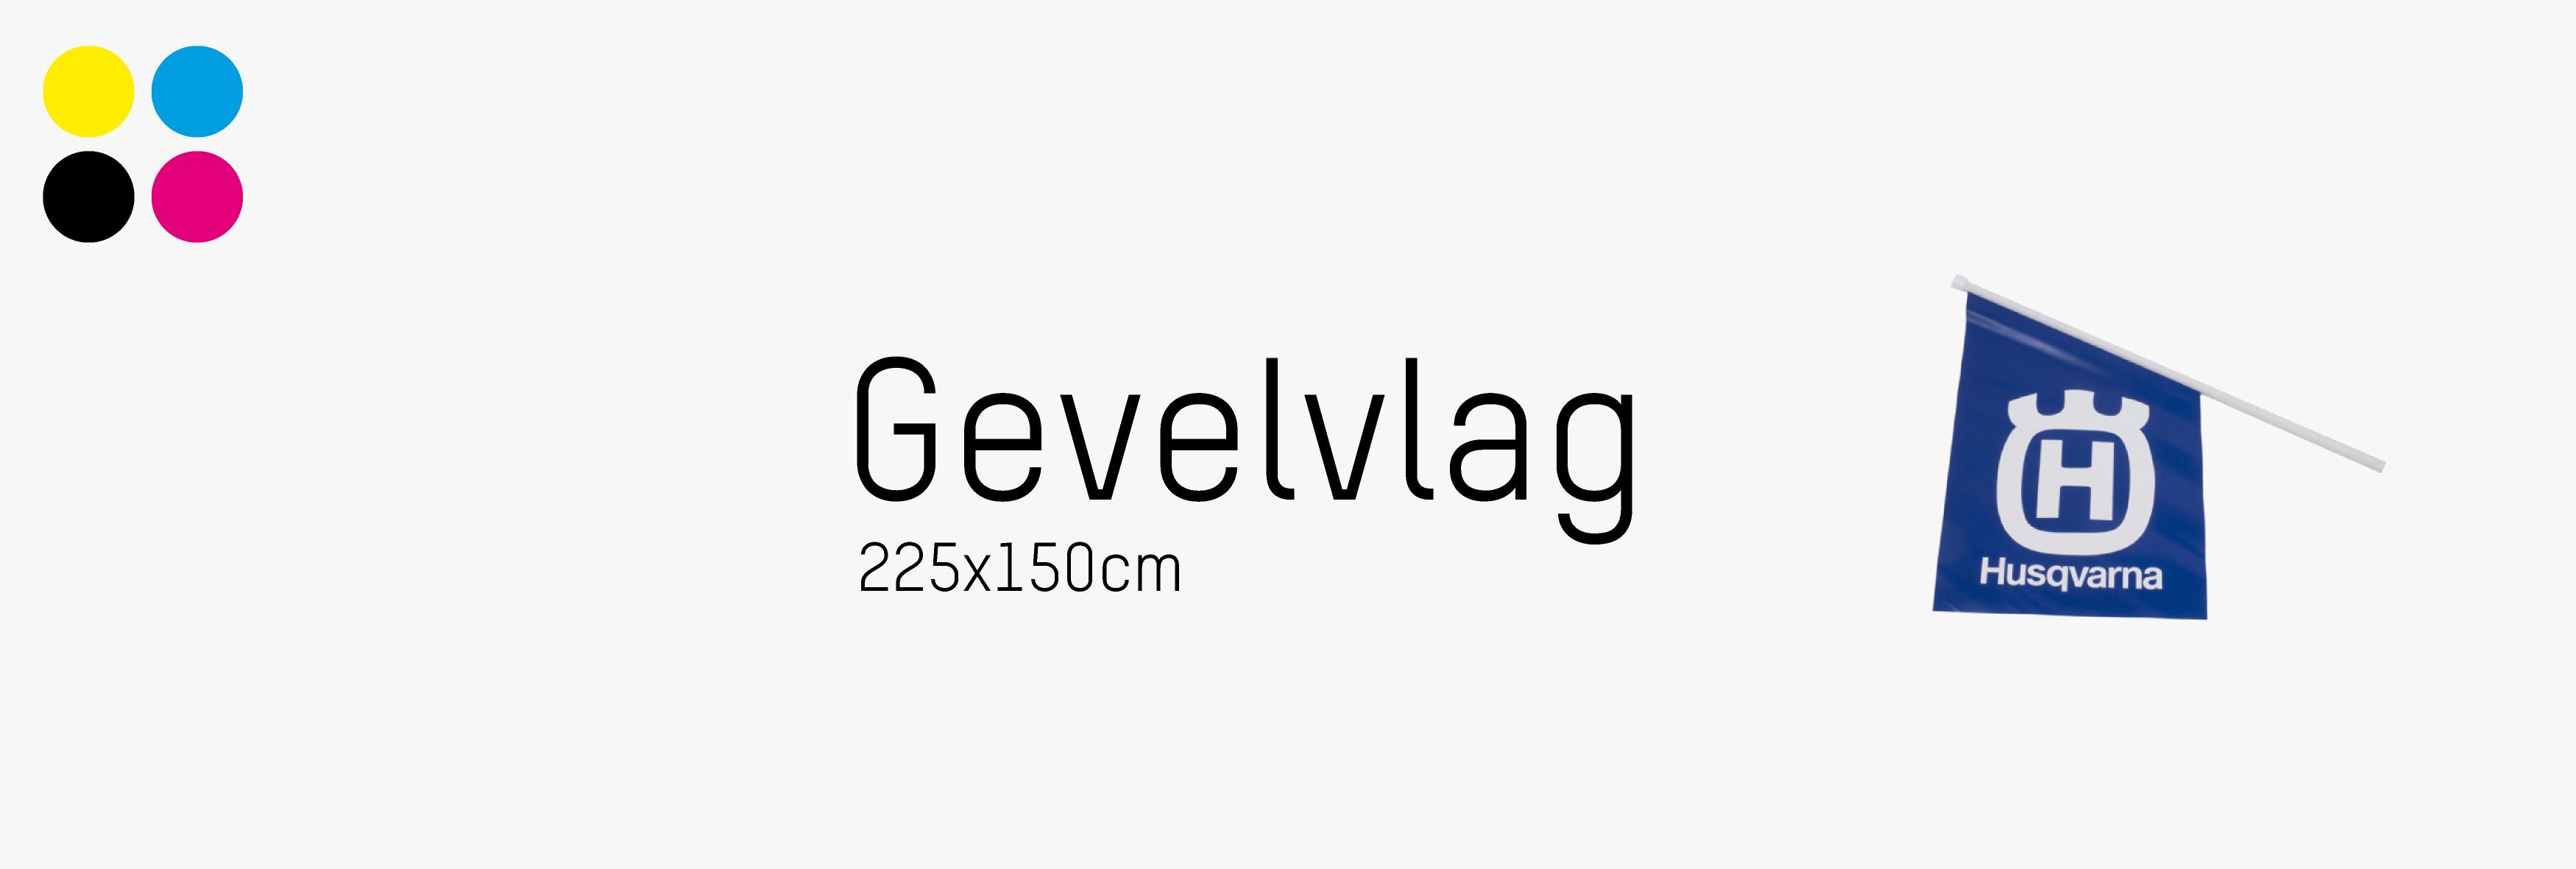 gevelvlag-225x150cm